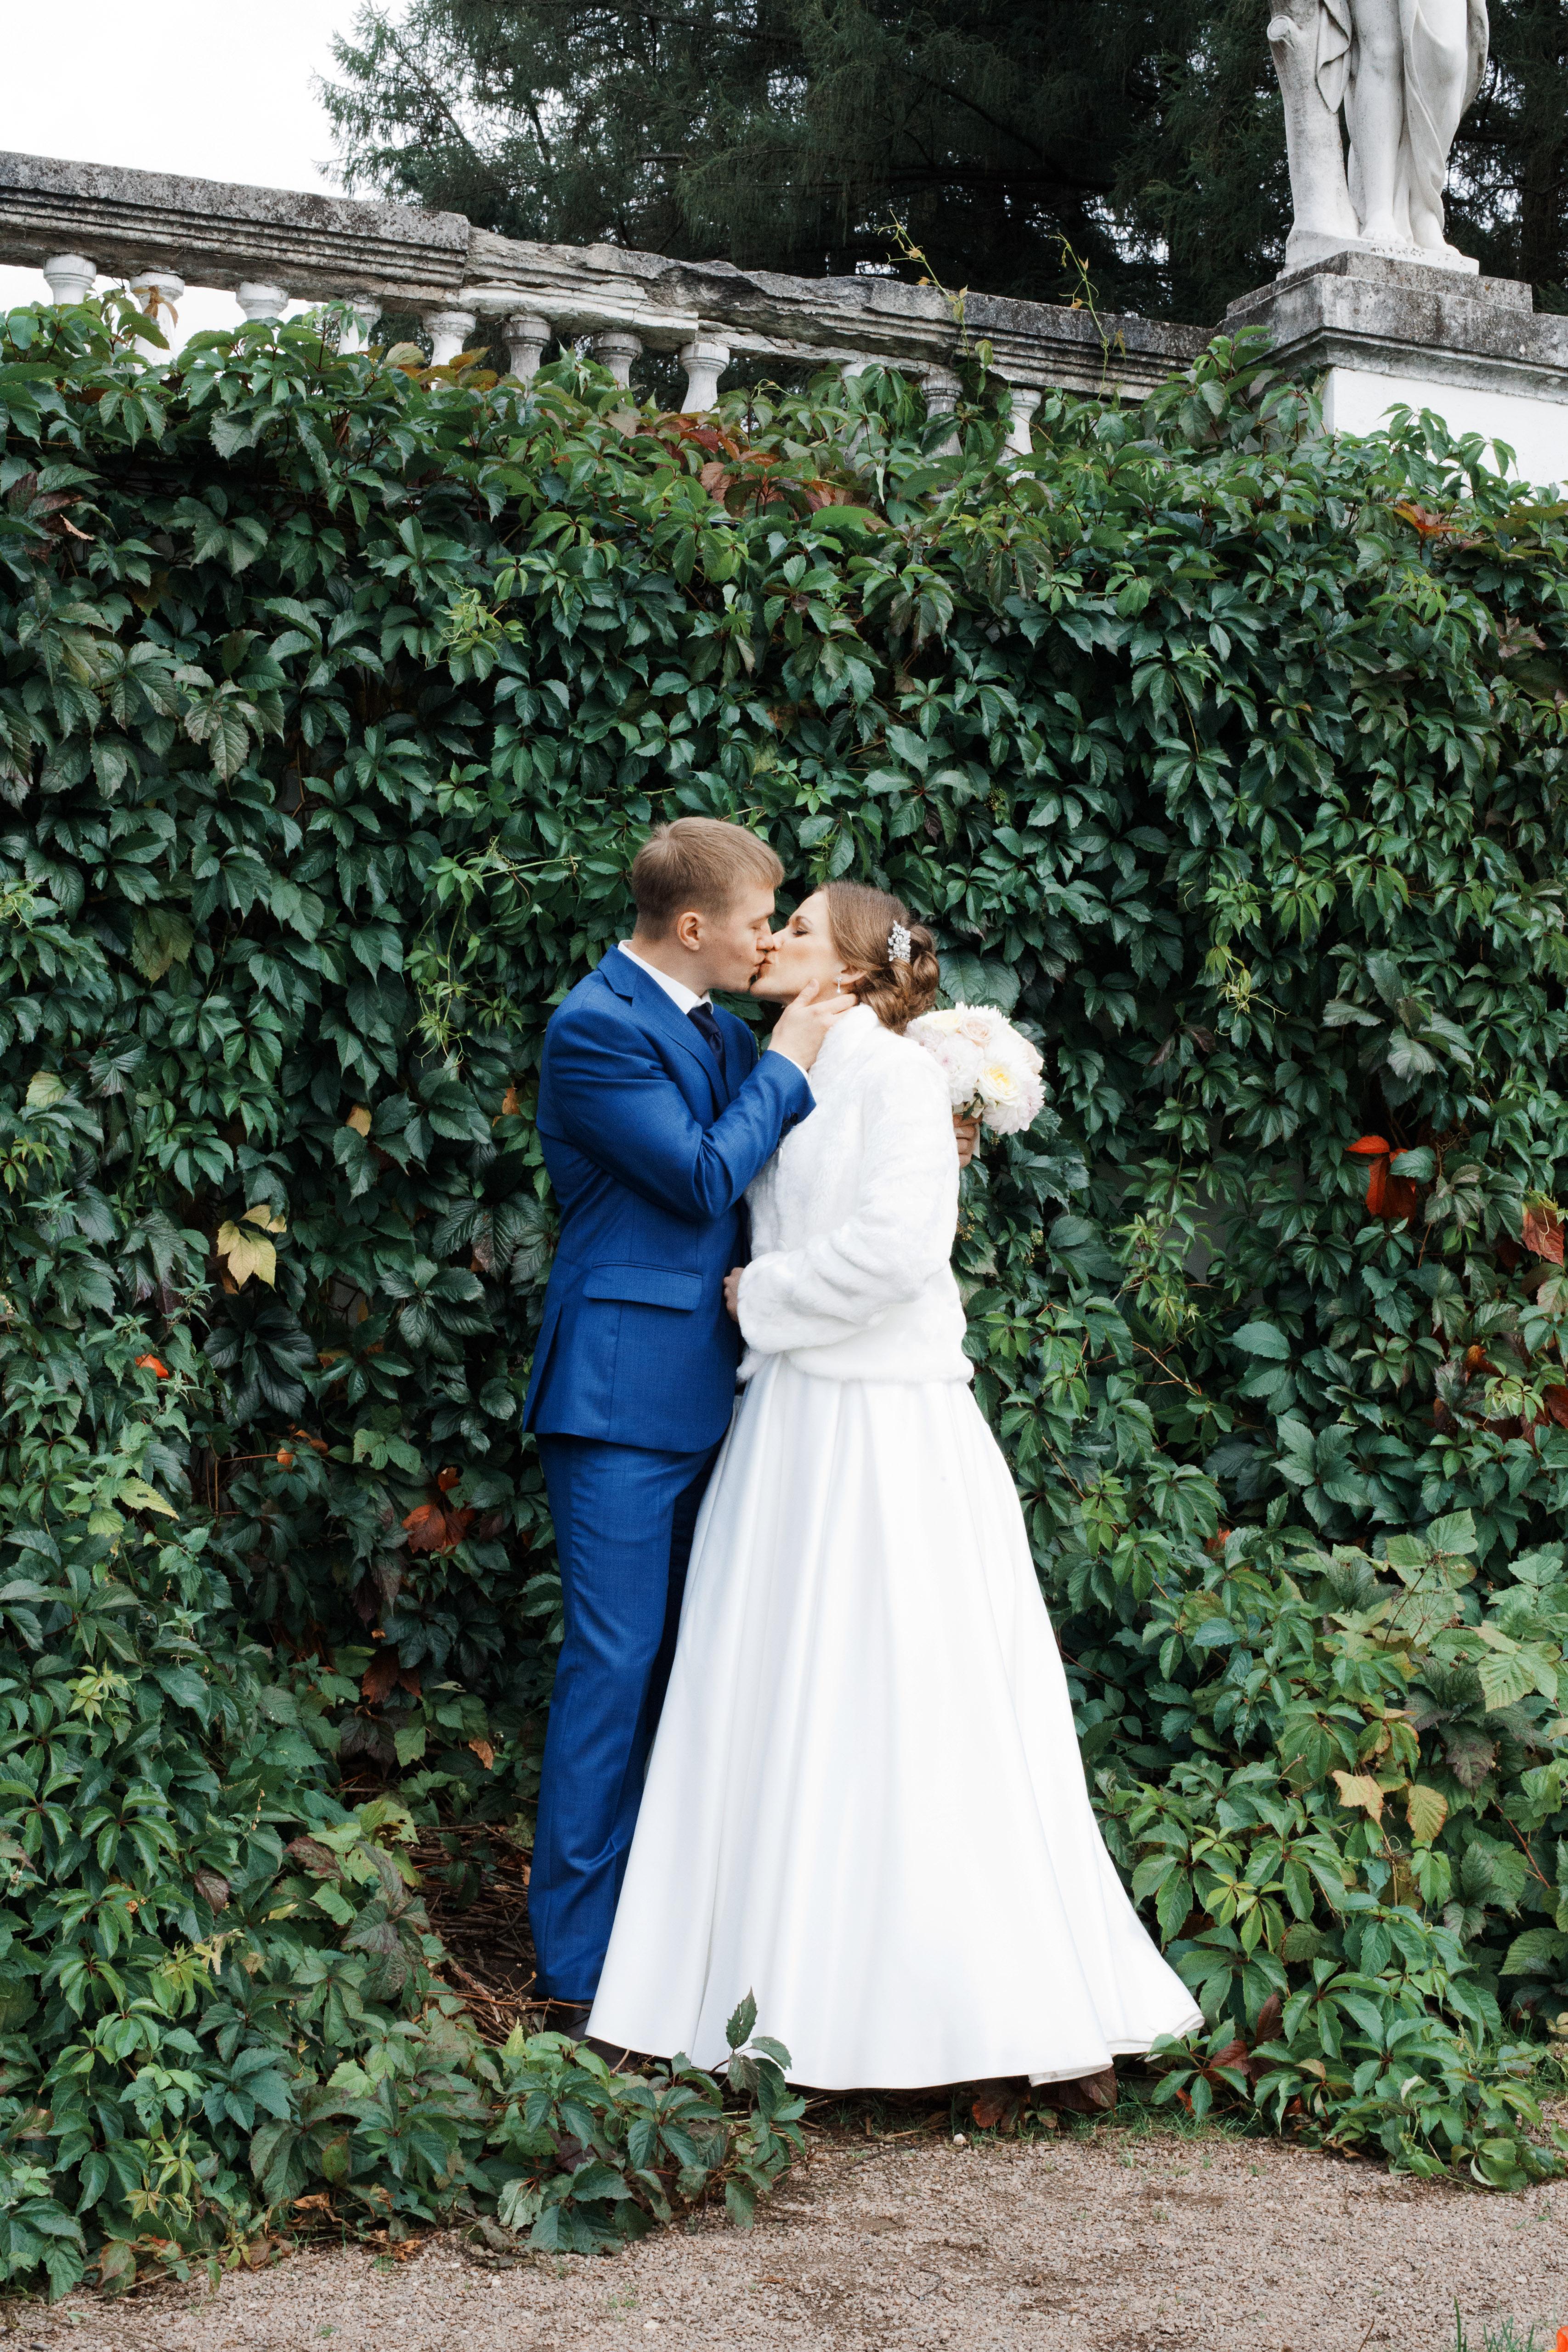 Lovely wedding day Anya and Vitaly: